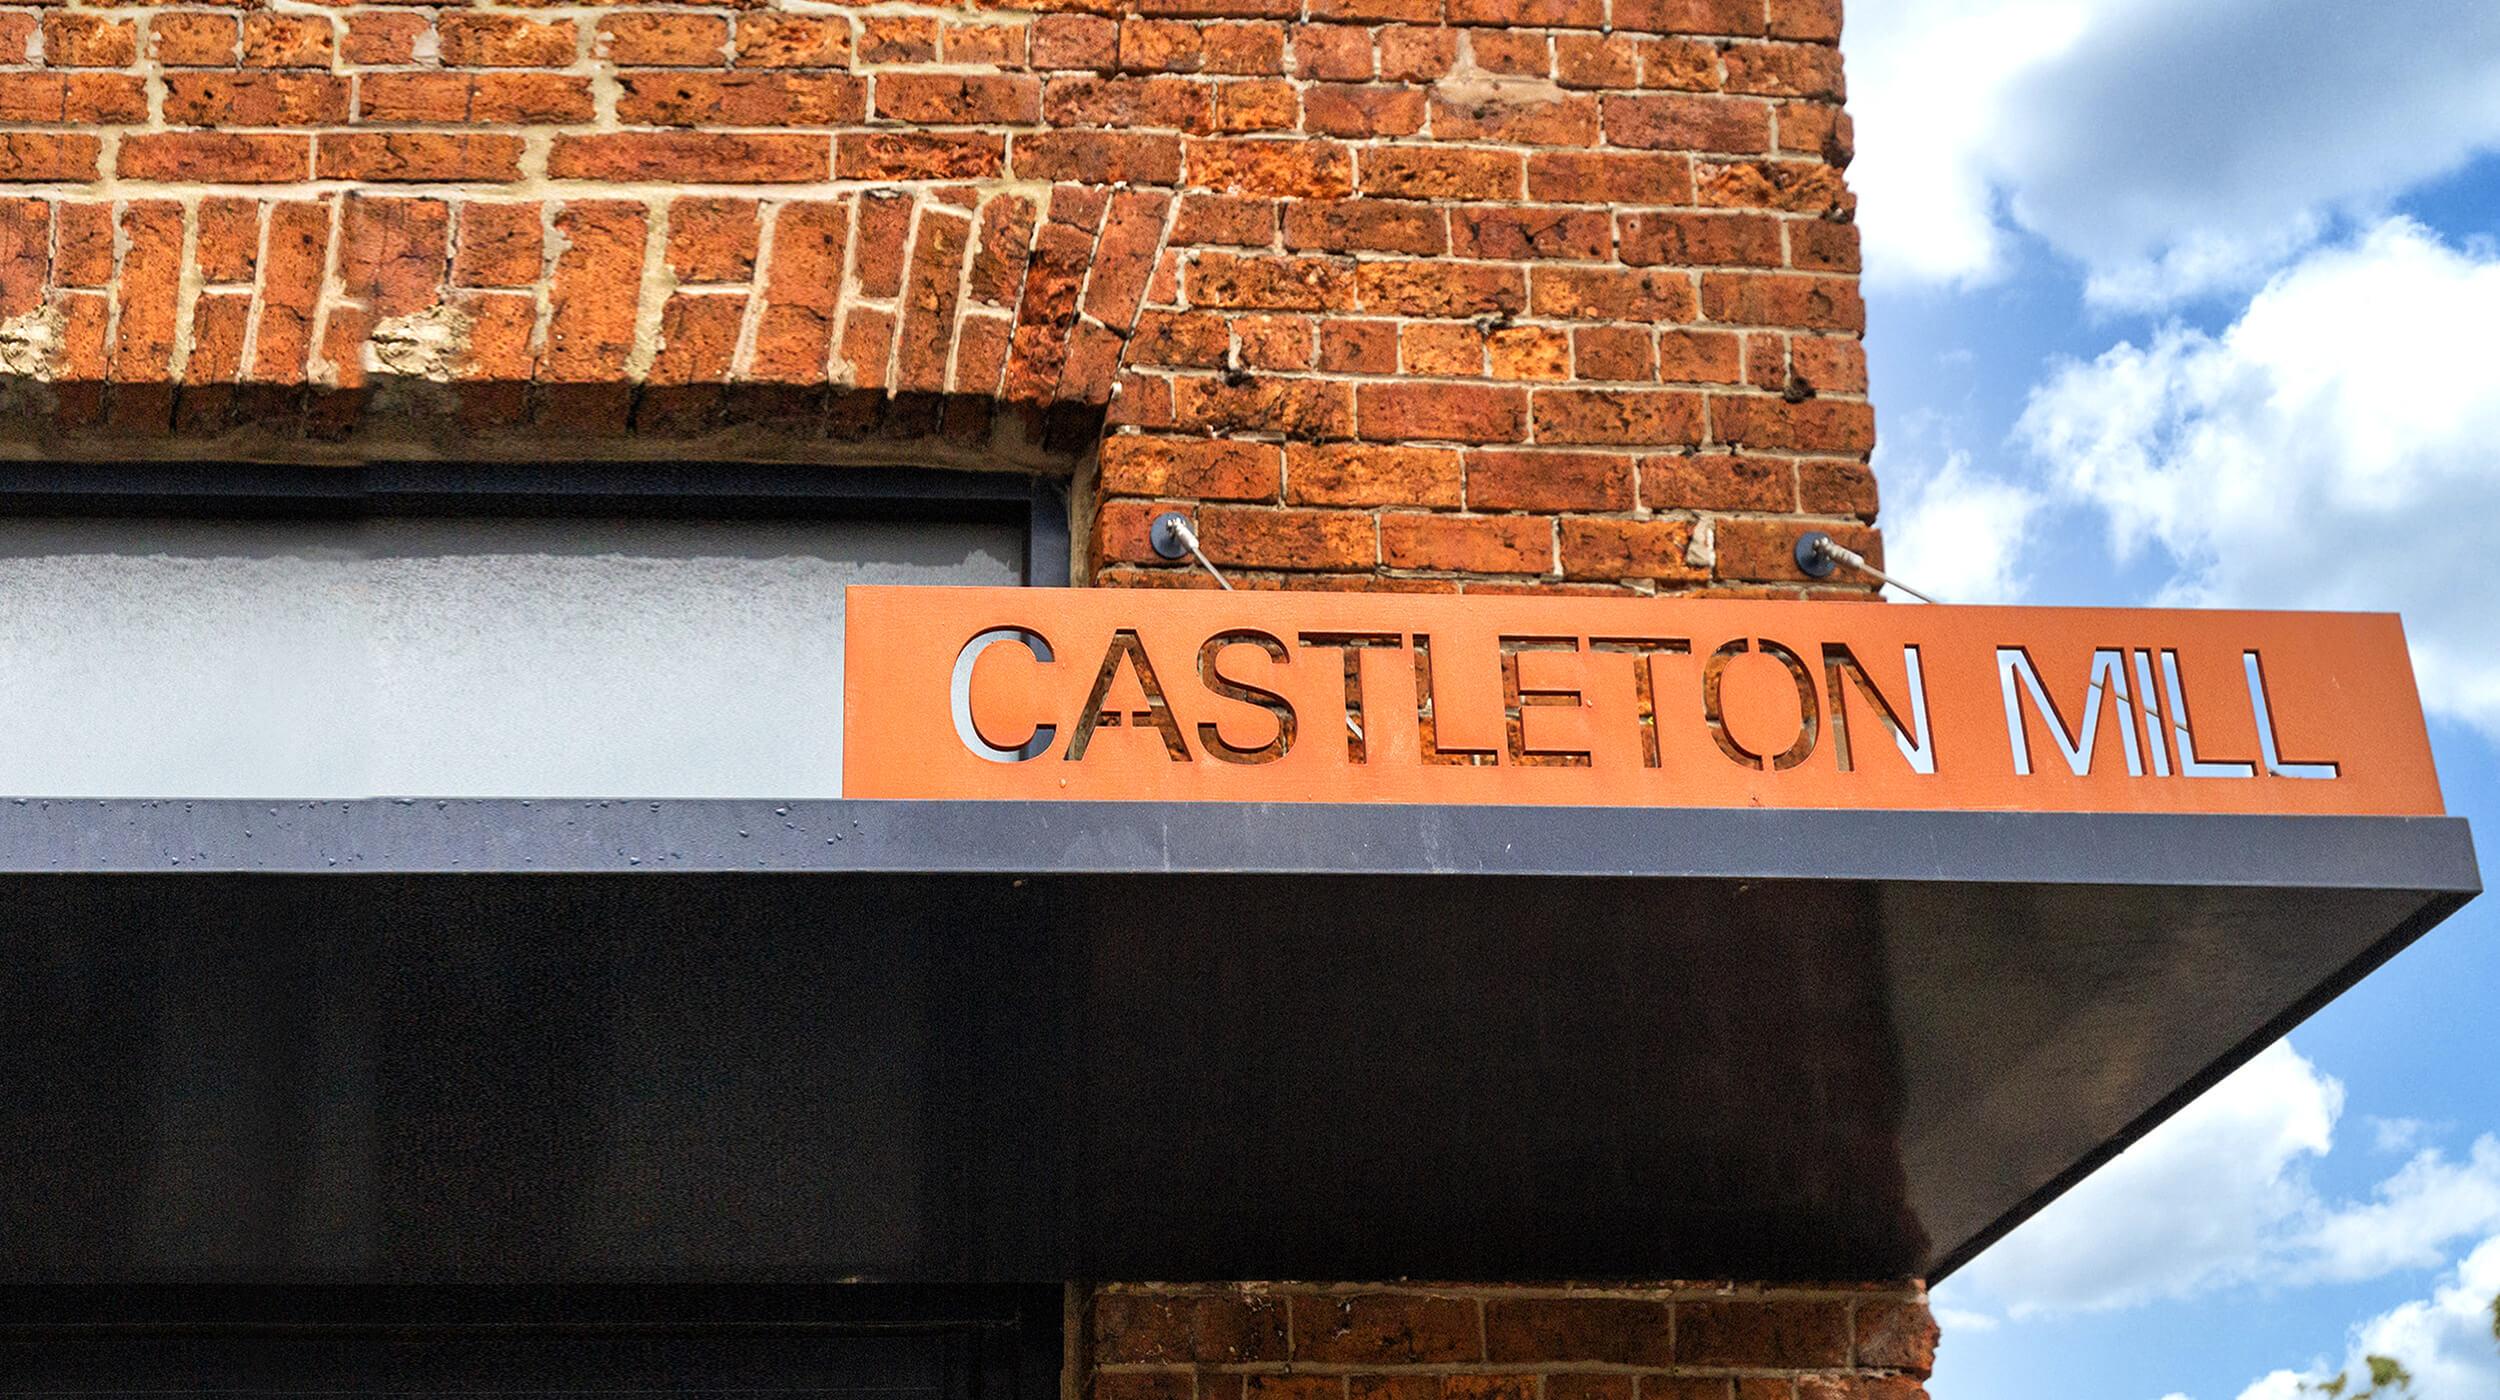 Exterior Castleton Mill signage - meet the team at Castleton Mill